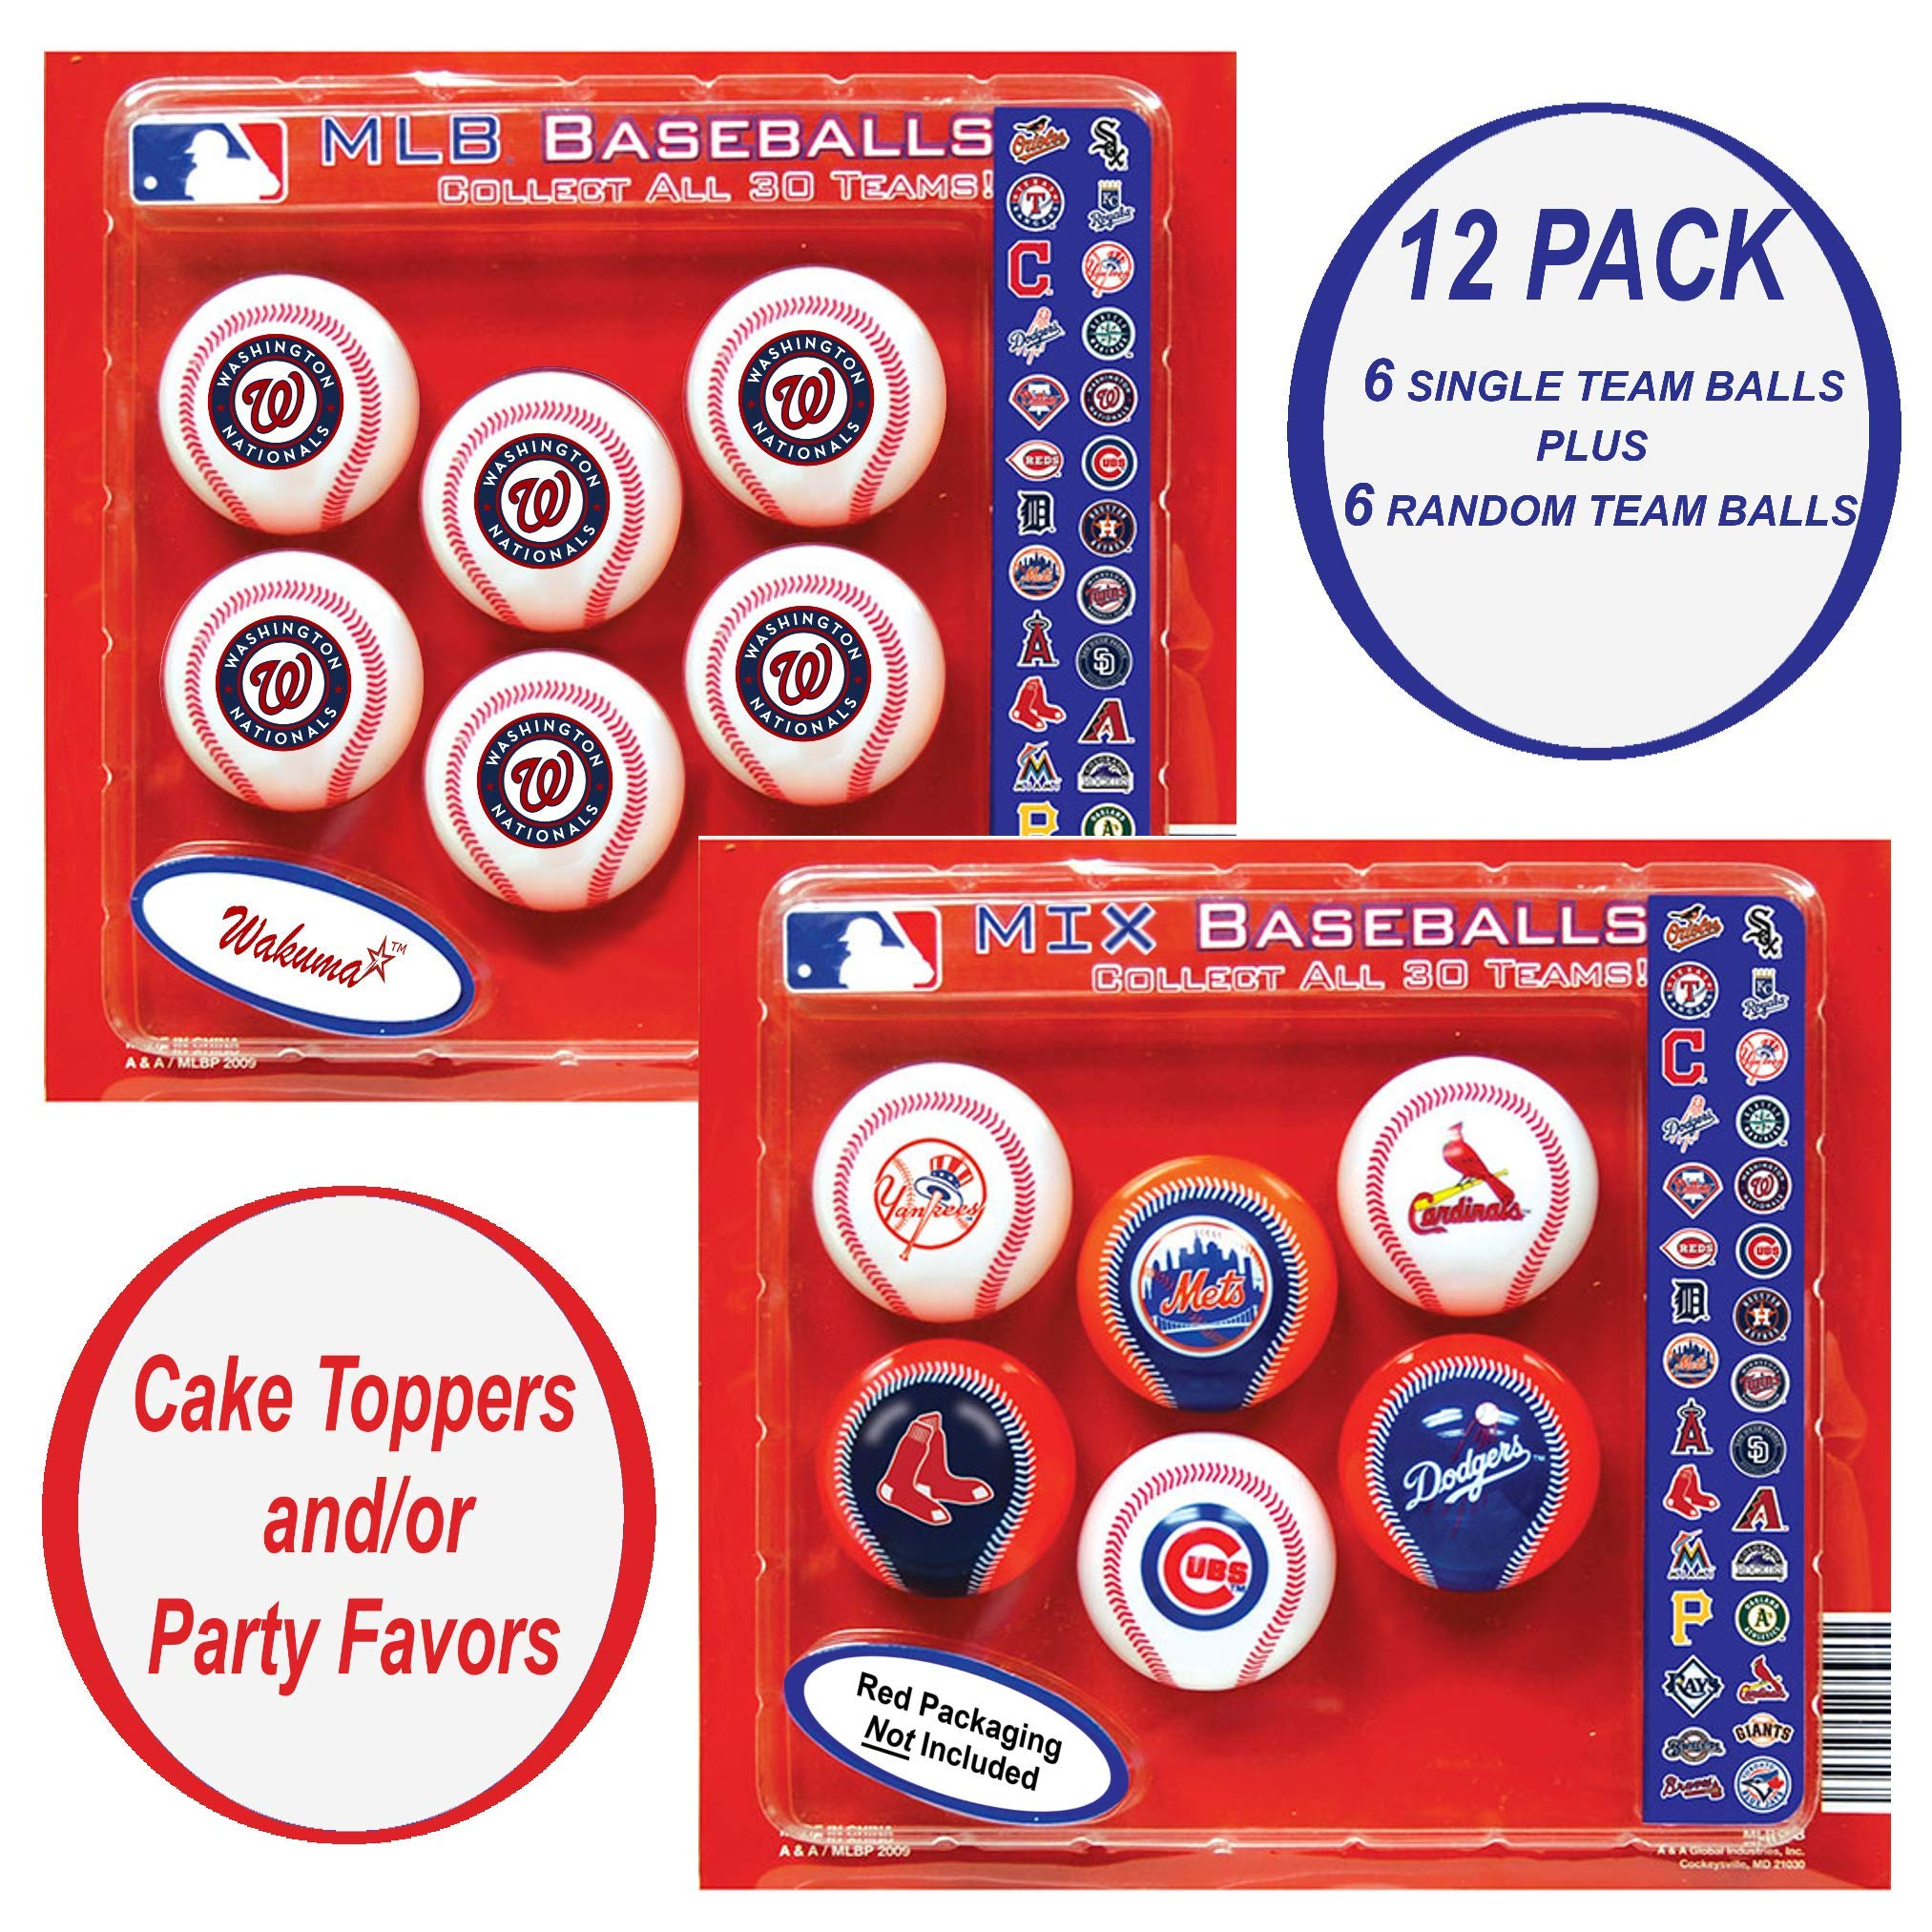 Washington Nationals Cake Topper. Baseball Birthday Cupcake Decorations & Party Favor Supplies by Wakuma